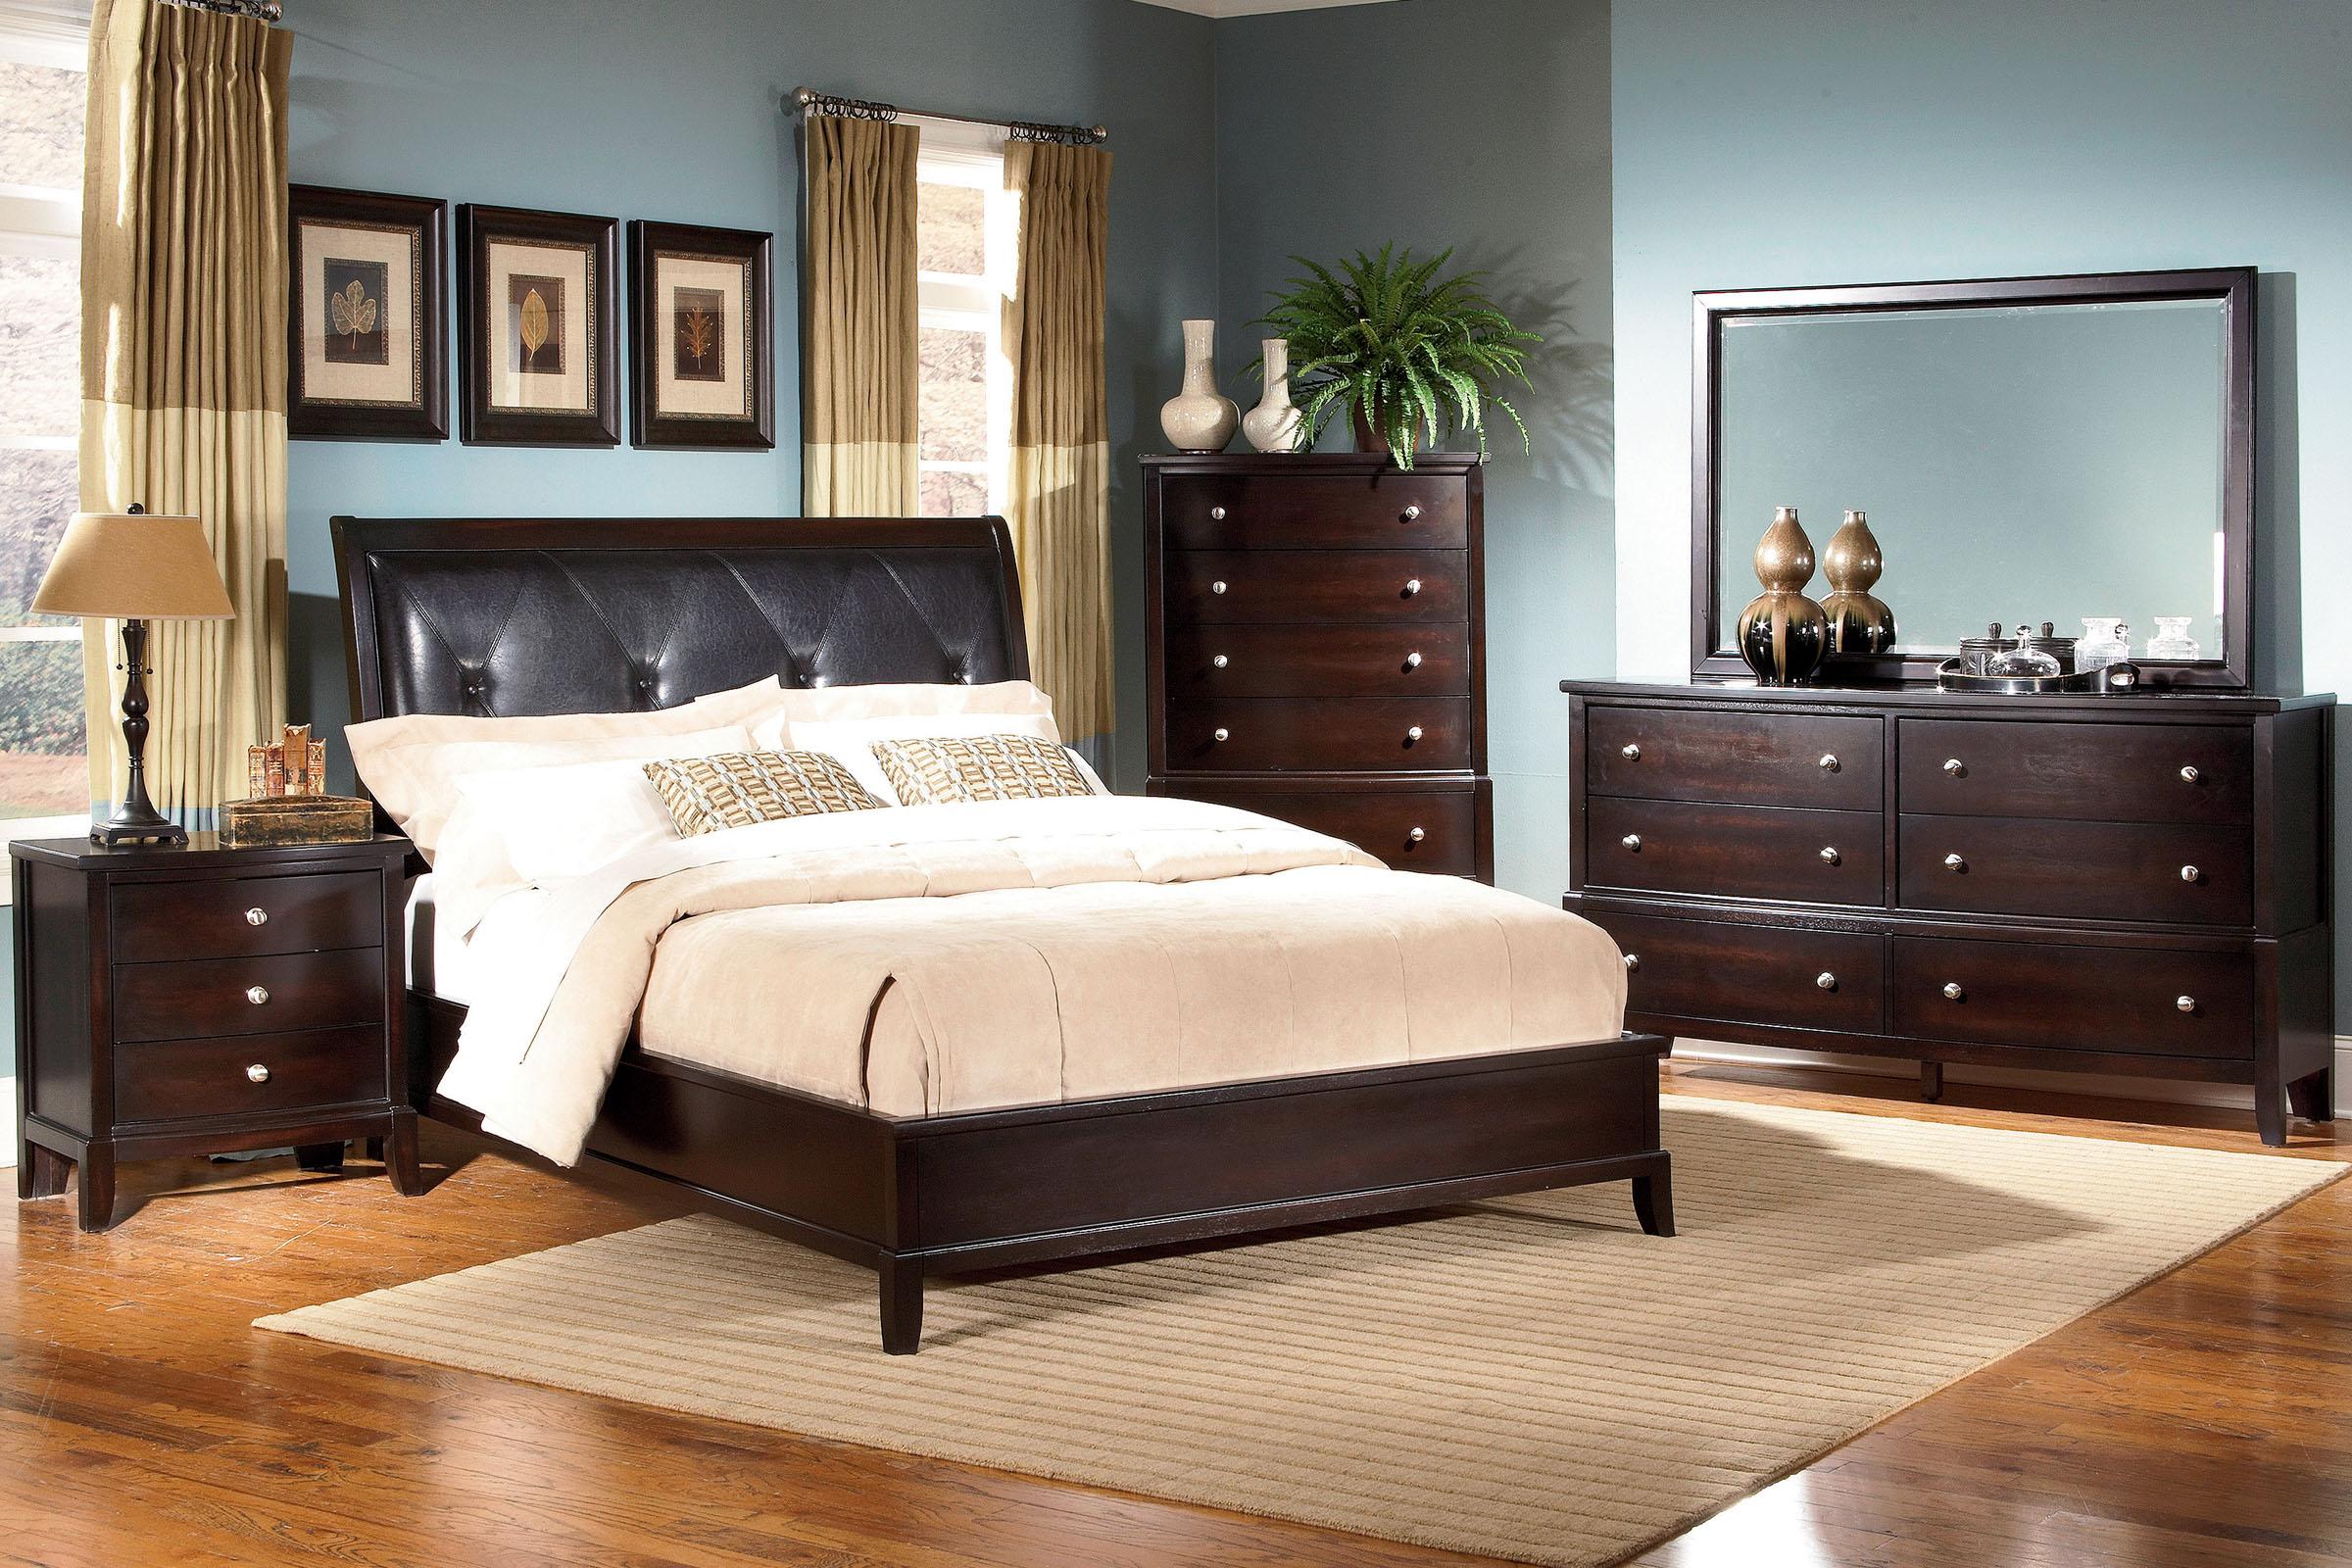 Unique 5-Piece King Bedroom Set at Gardner-White